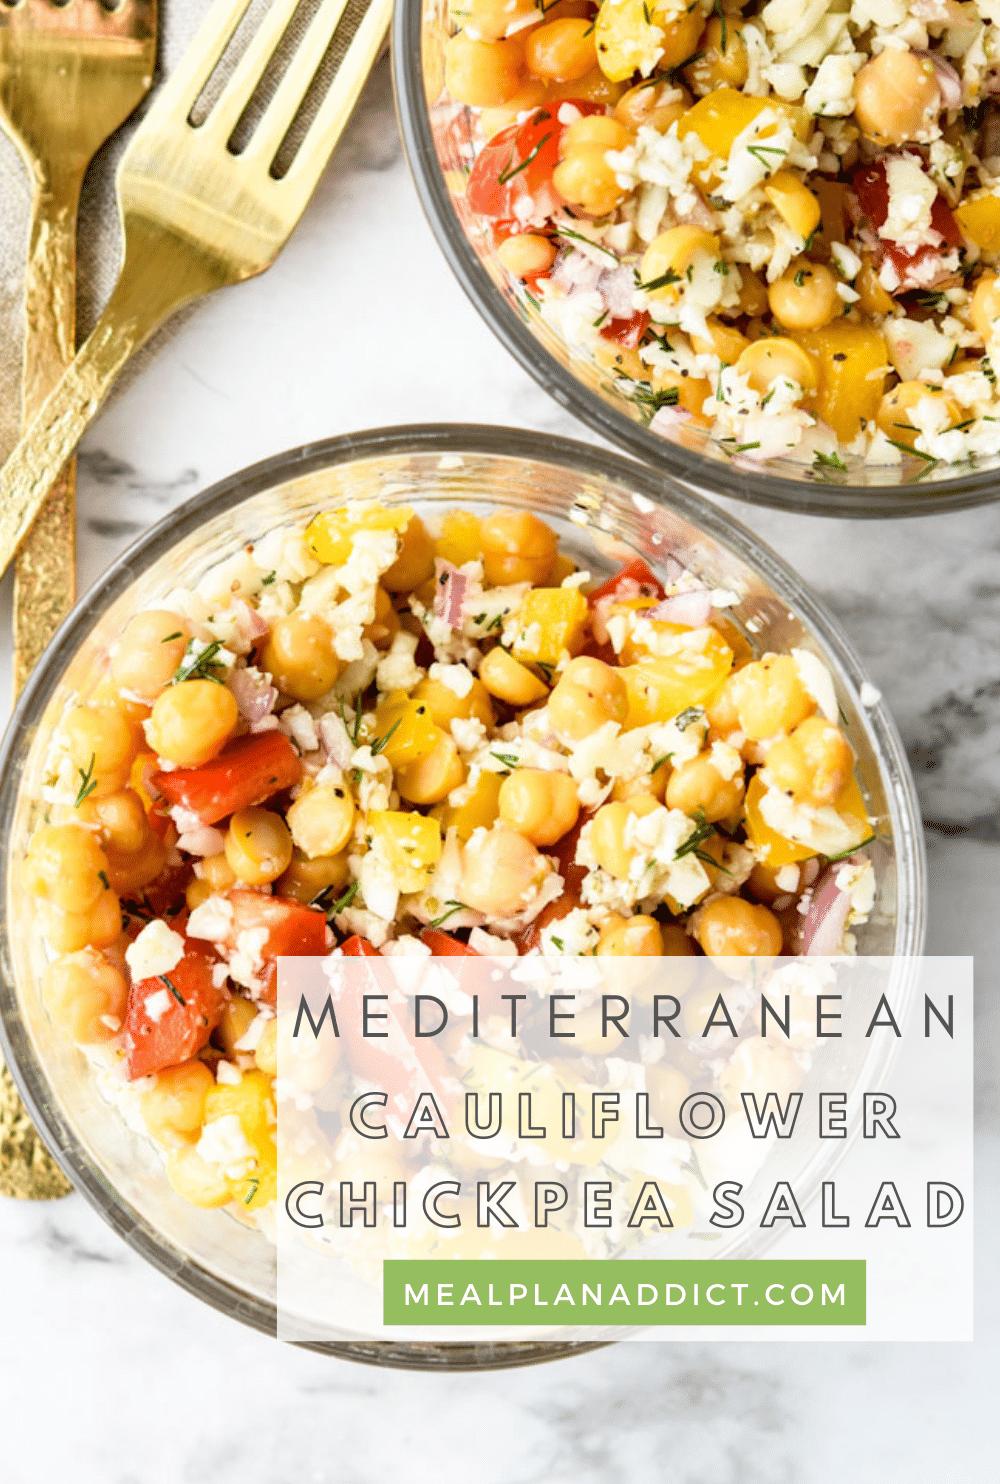 Cauliflower chickpea salad pin for Pinterest